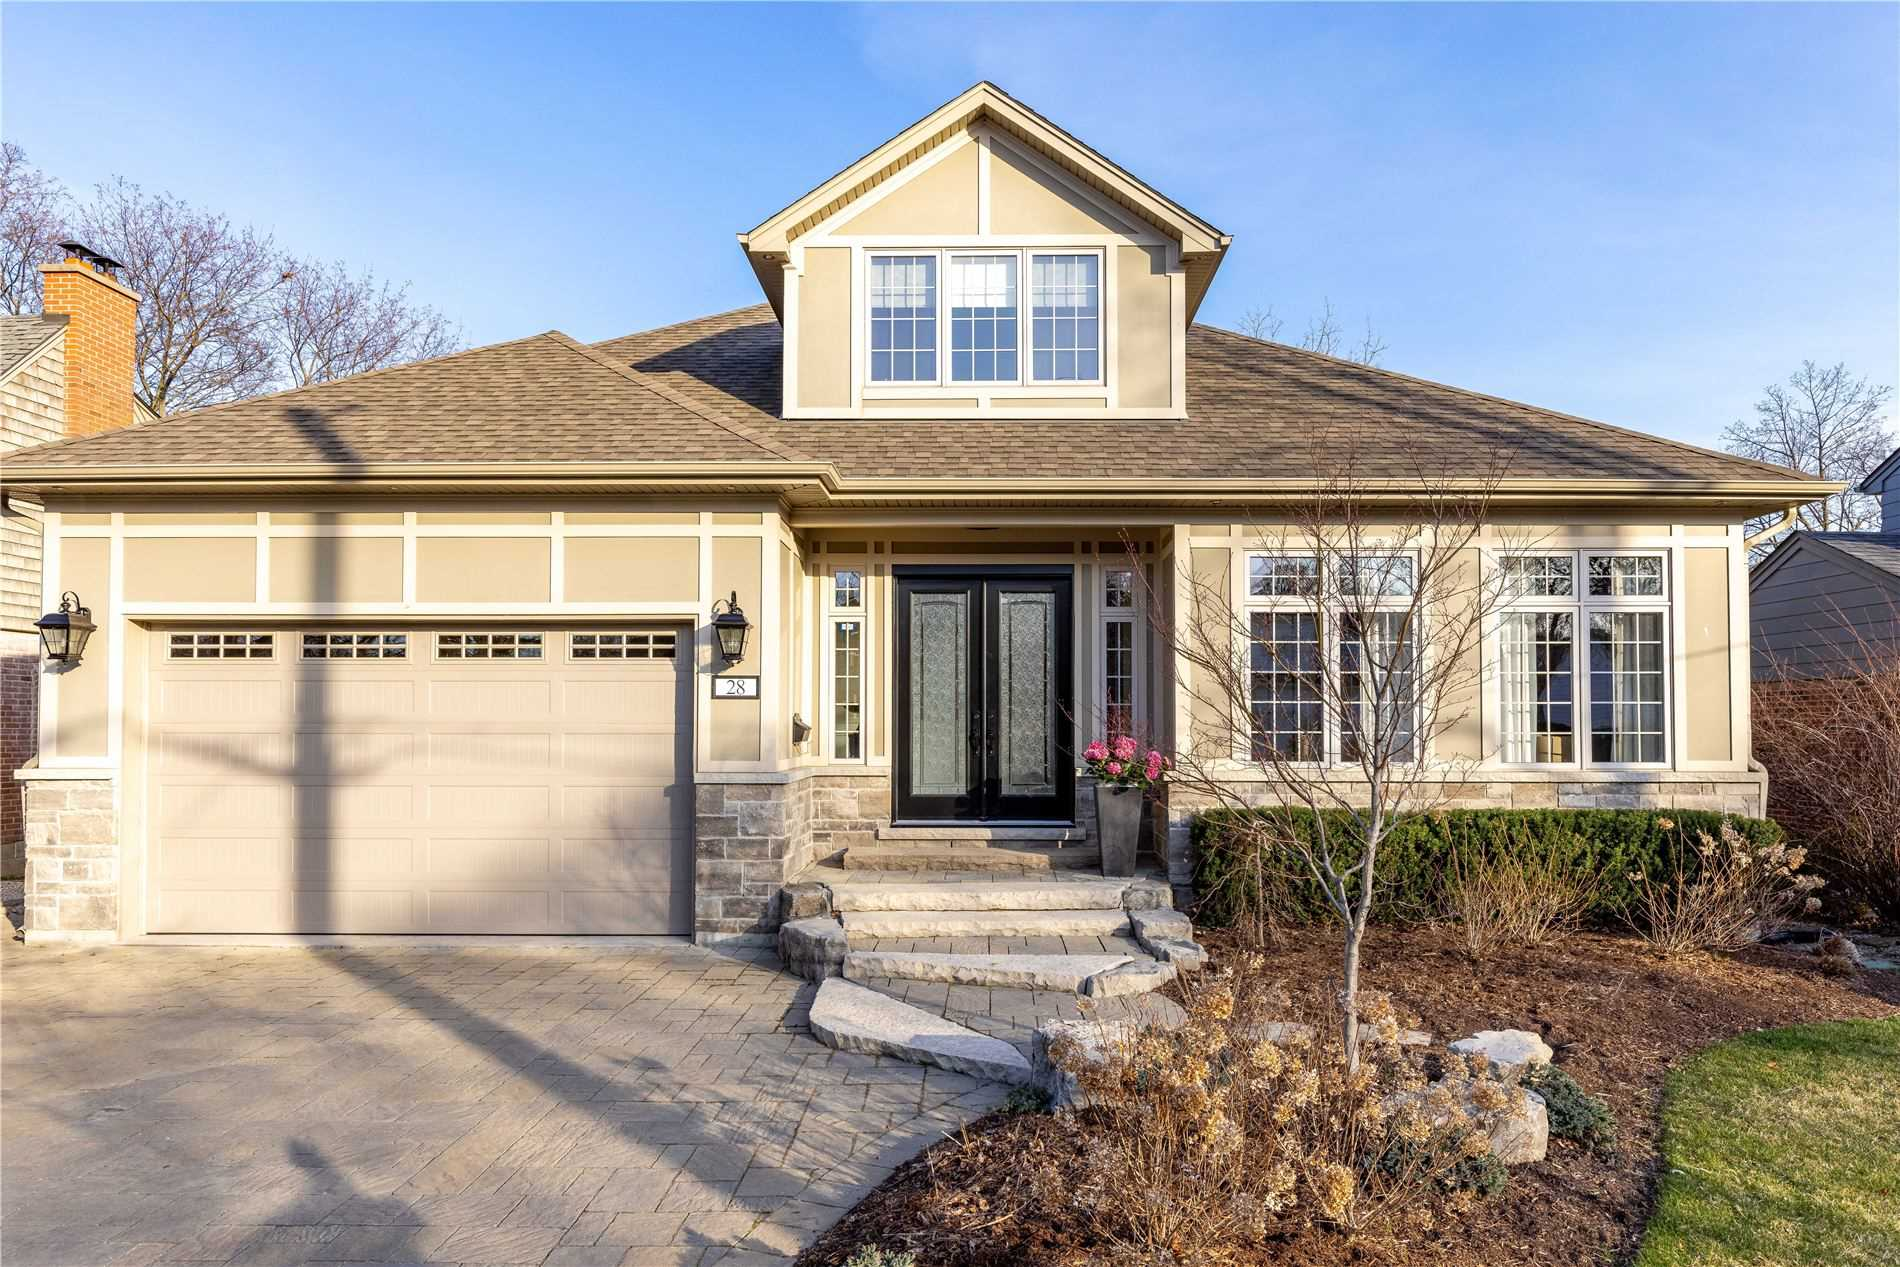 28 Highland Rd, Oakville, Ontario L6K1S7, 4 Bedrooms Bedrooms, 9 Rooms Rooms,4 BathroomsBathrooms,Detached,For Sale,Highland,W5159980